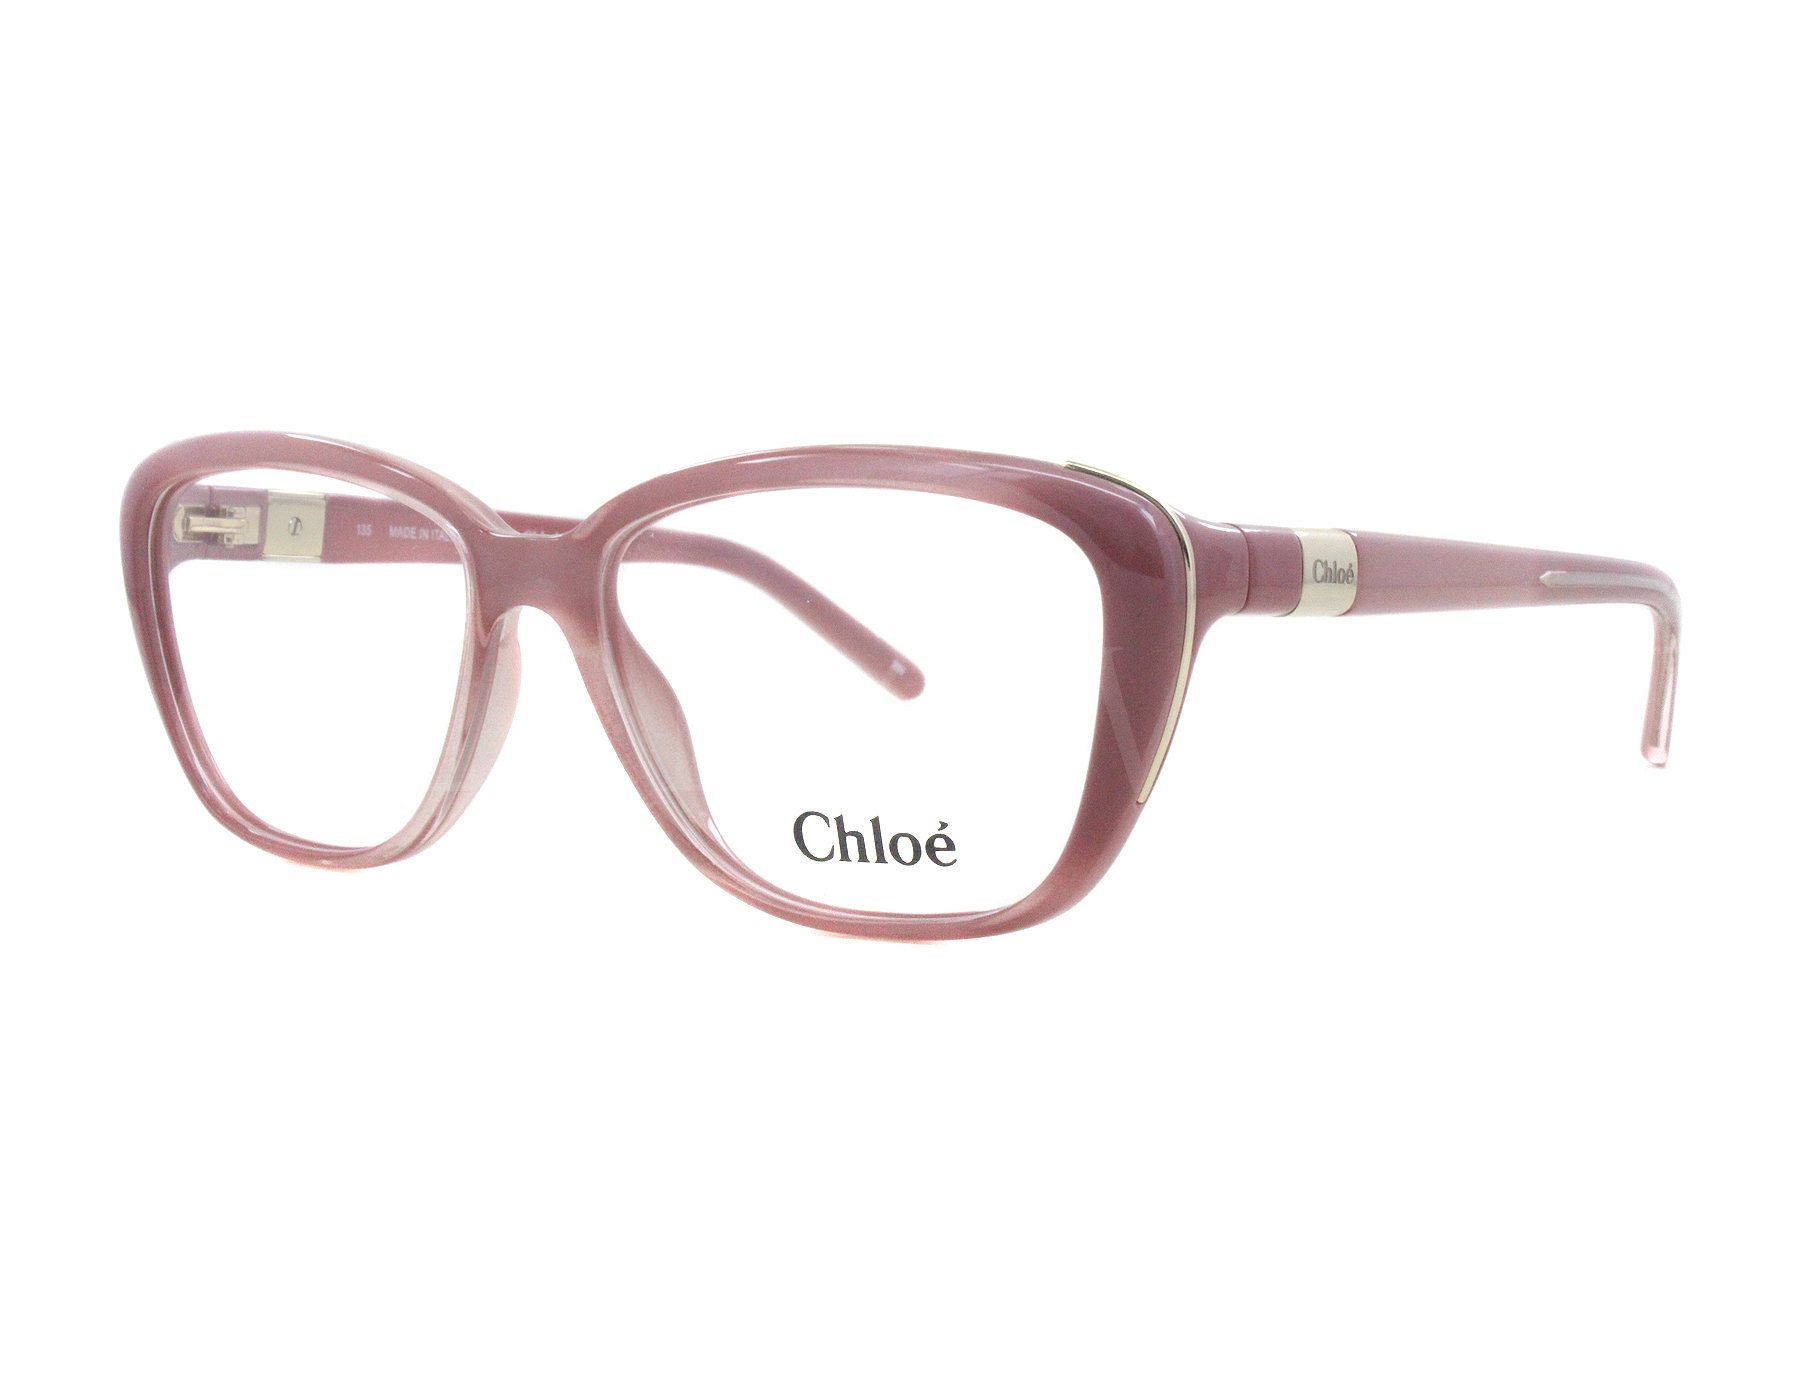 406fd1336d5 Details about NEW Chloe CE 2623 643 Antique Rose Optical Eyeglasses Frames